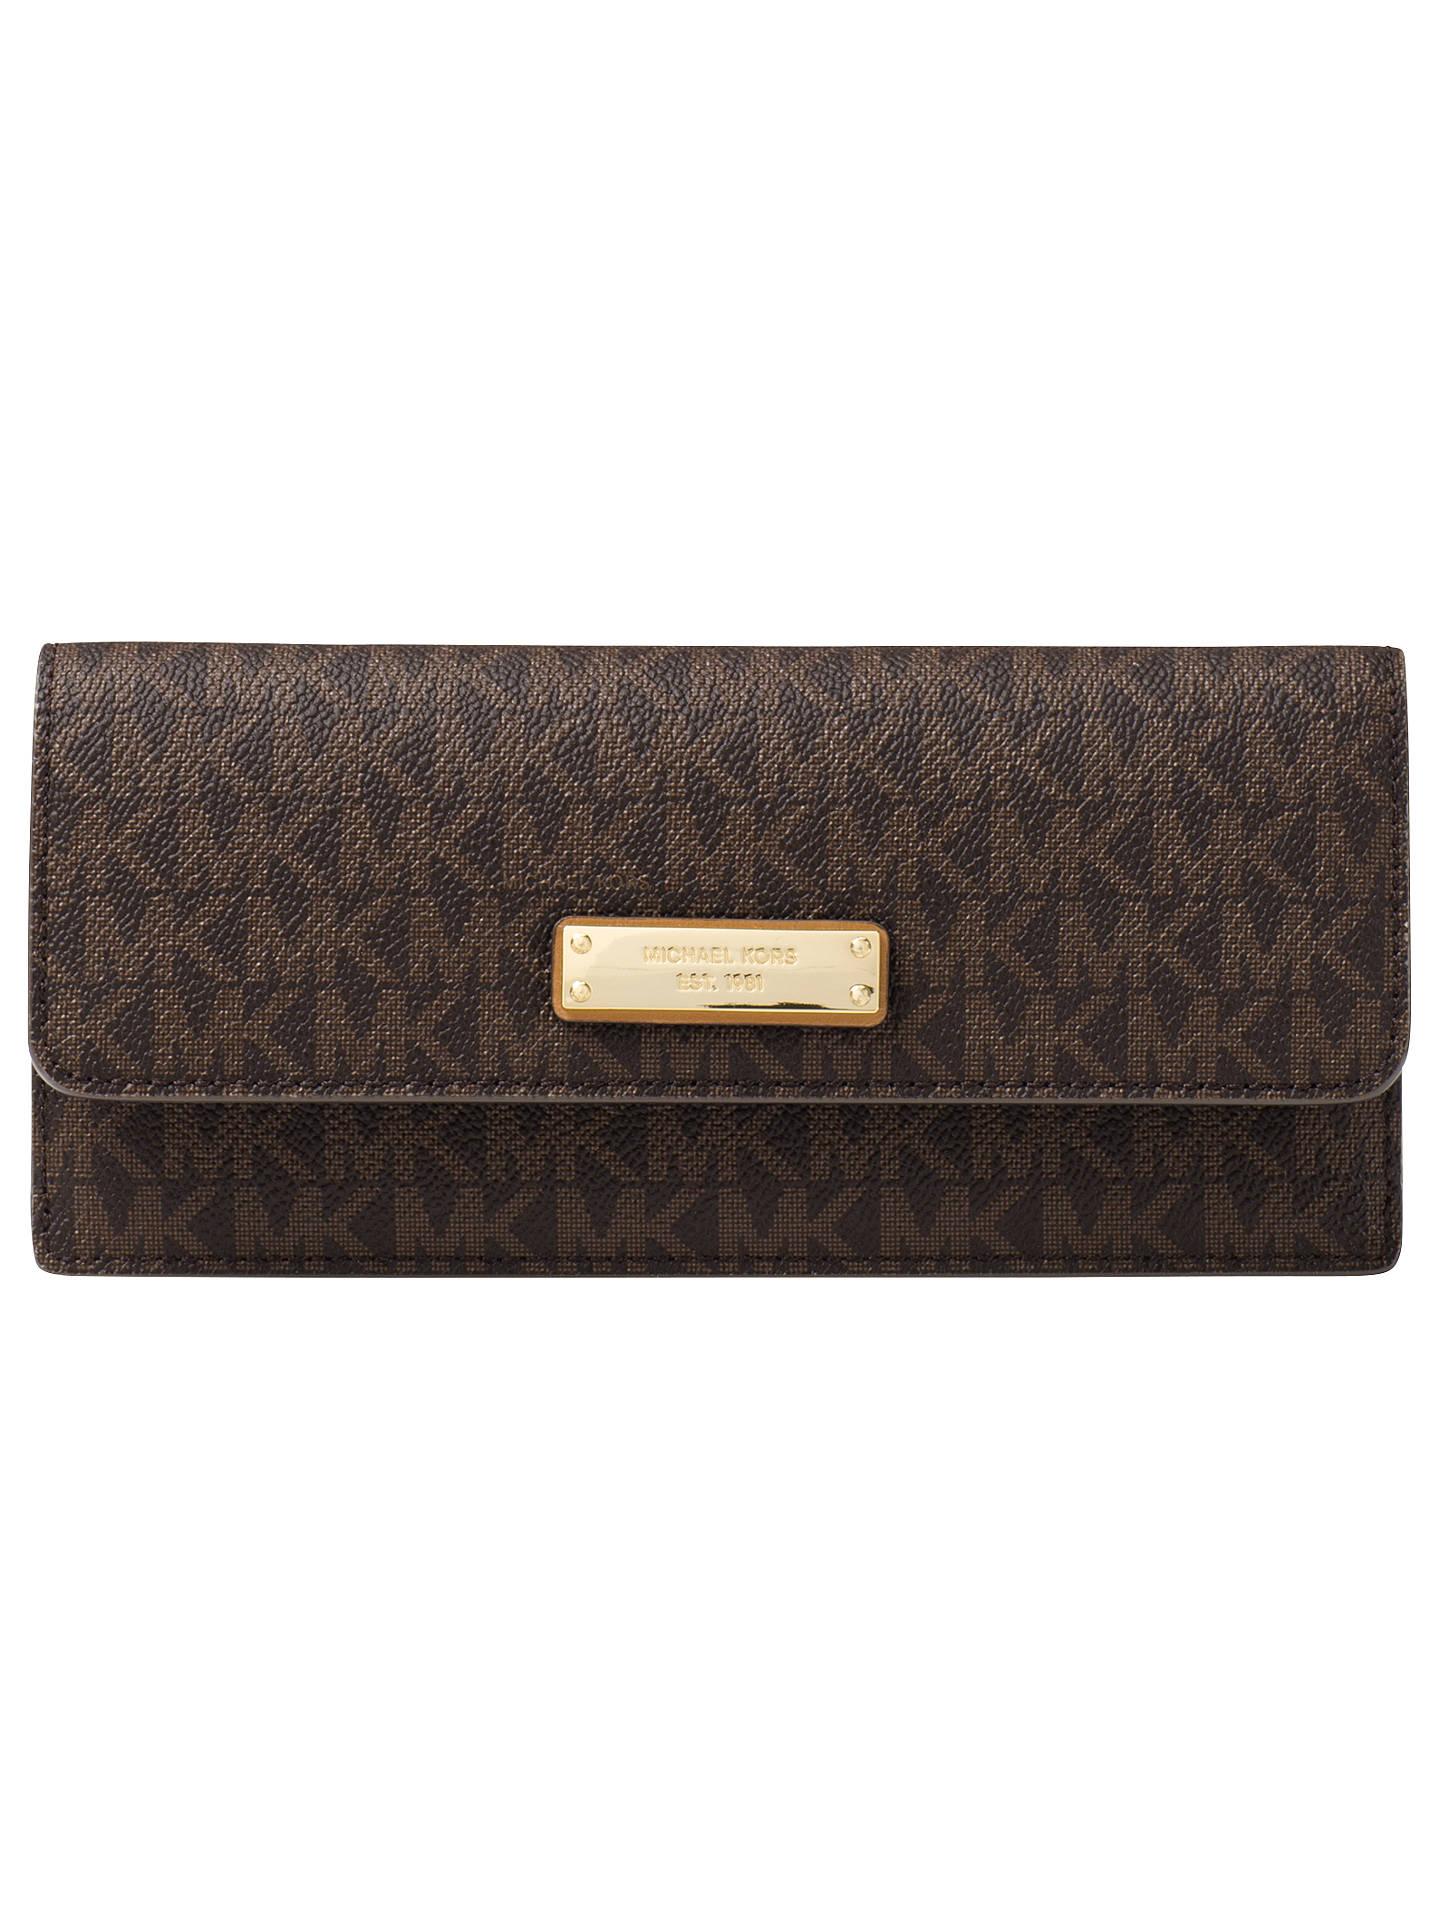 15fd16f4dbf Buy MICHAEL Michael Kors Money Pieces Leather Flat Purse, Brown Online at  johnlewis.com ...